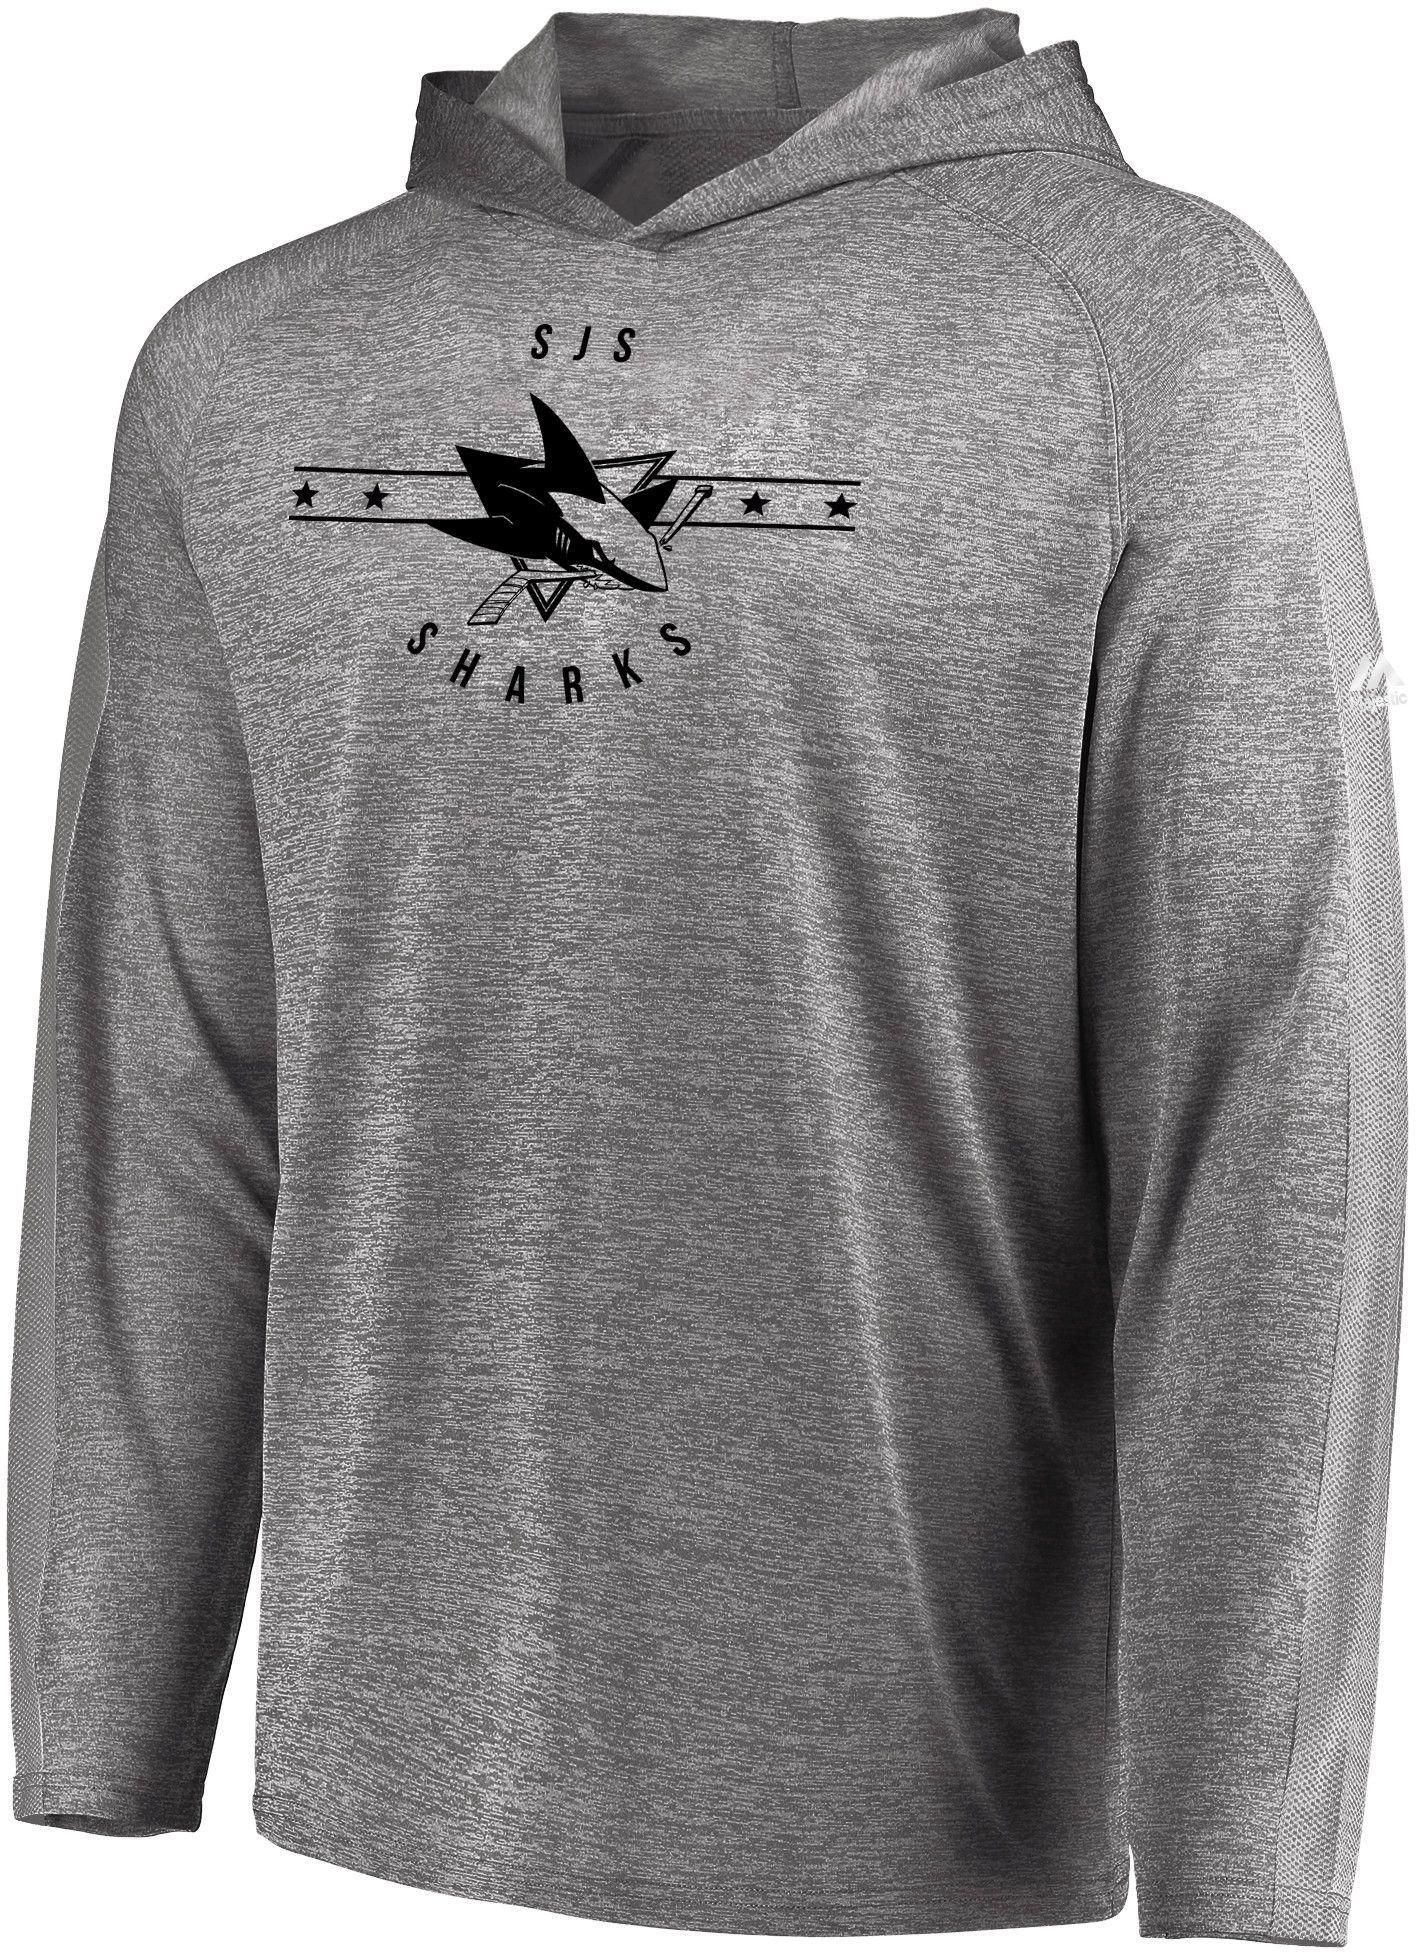 Majestic Men S San Jose Sharks Fan Flow Heather Grey Size Smal Shirts